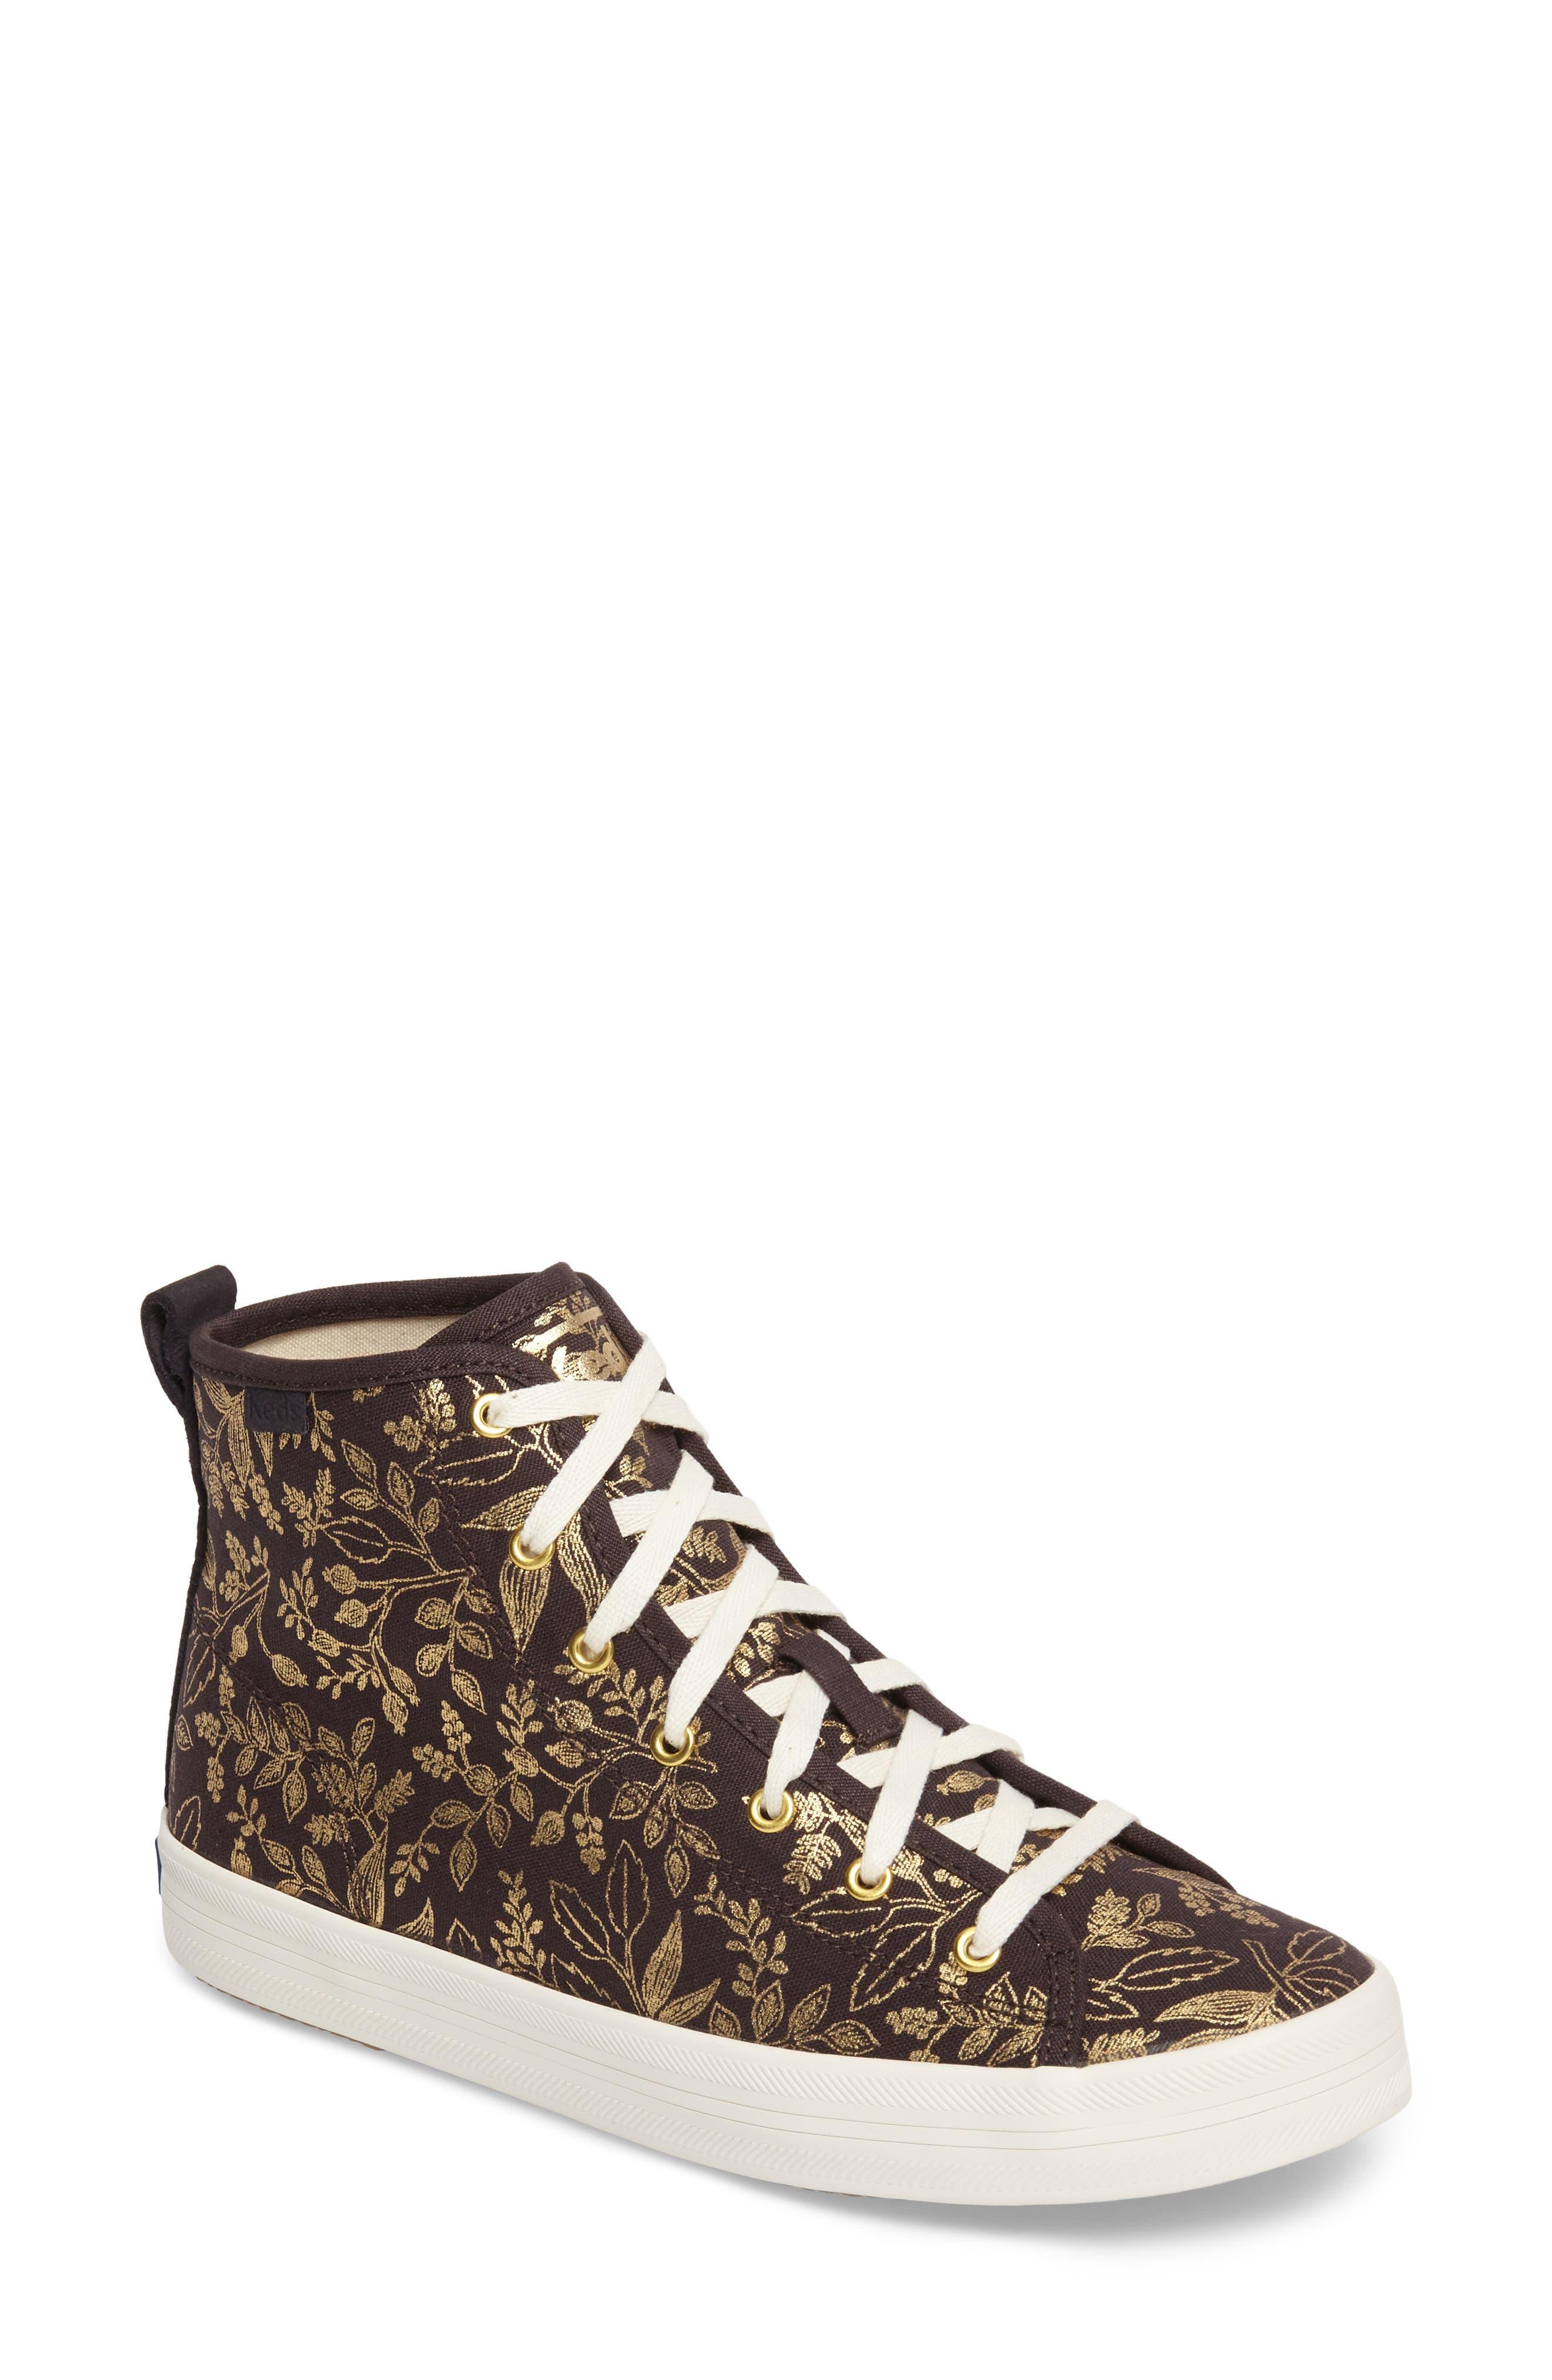 x Rifle Paper Co. Queen Anne High Top Sneaker,                             Main thumbnail 1, color,